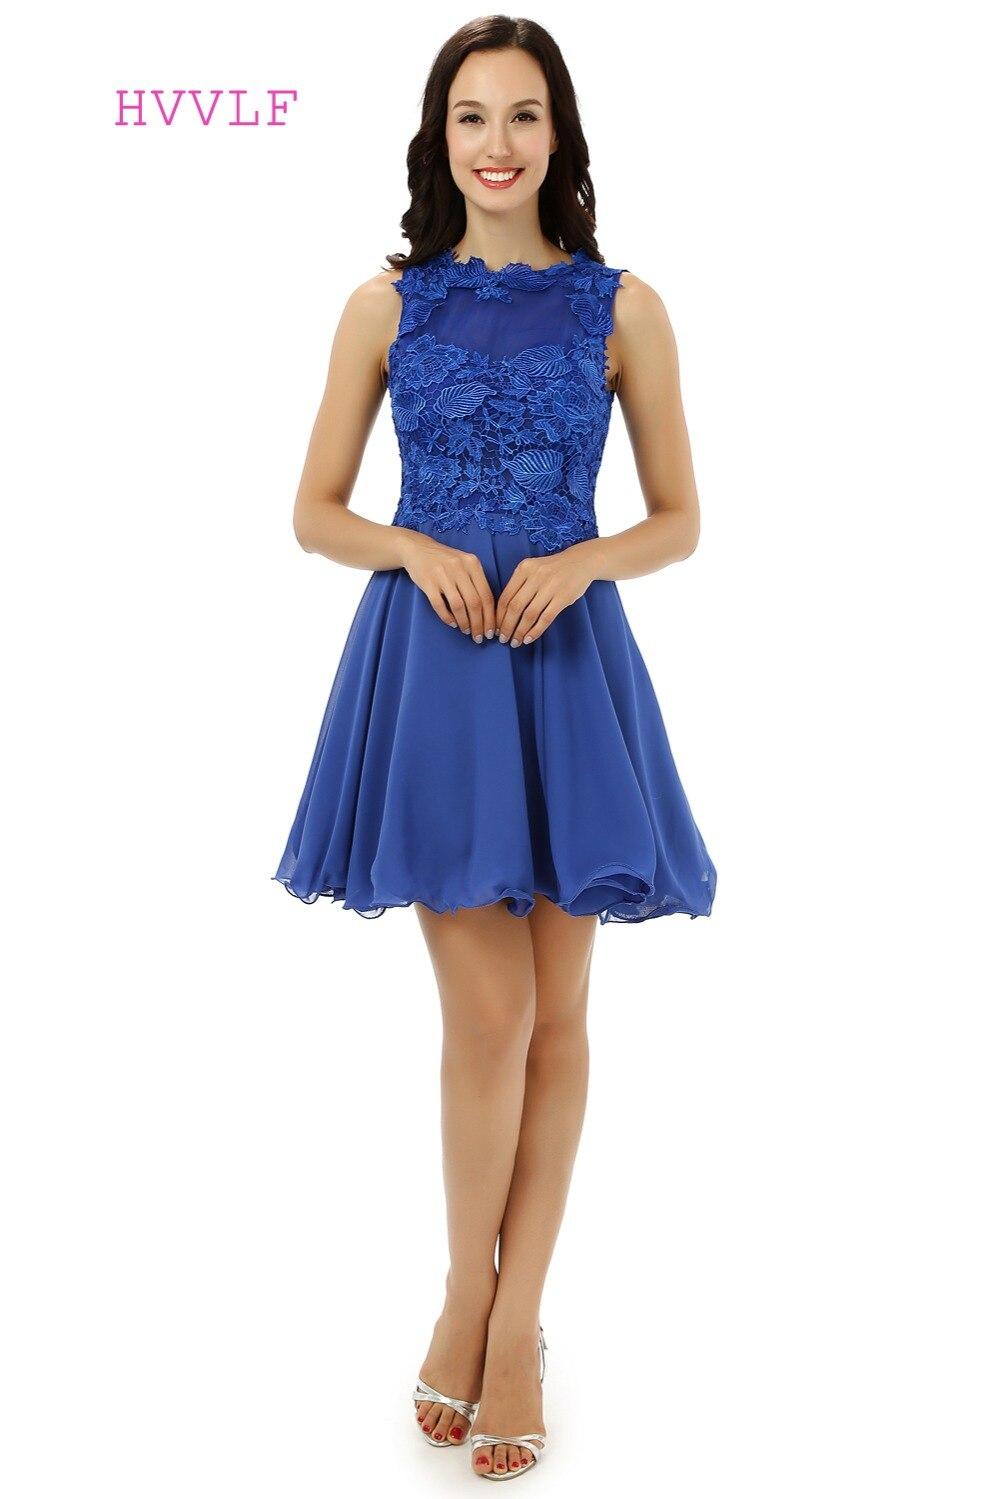 a09d3c7b4 HVVLF 2019 vestidos de fiesta a-line Sweetheart corto Mini azul Real Chiffon  encaje vestidos de cóctel fotos reales - a.spelacasino.me